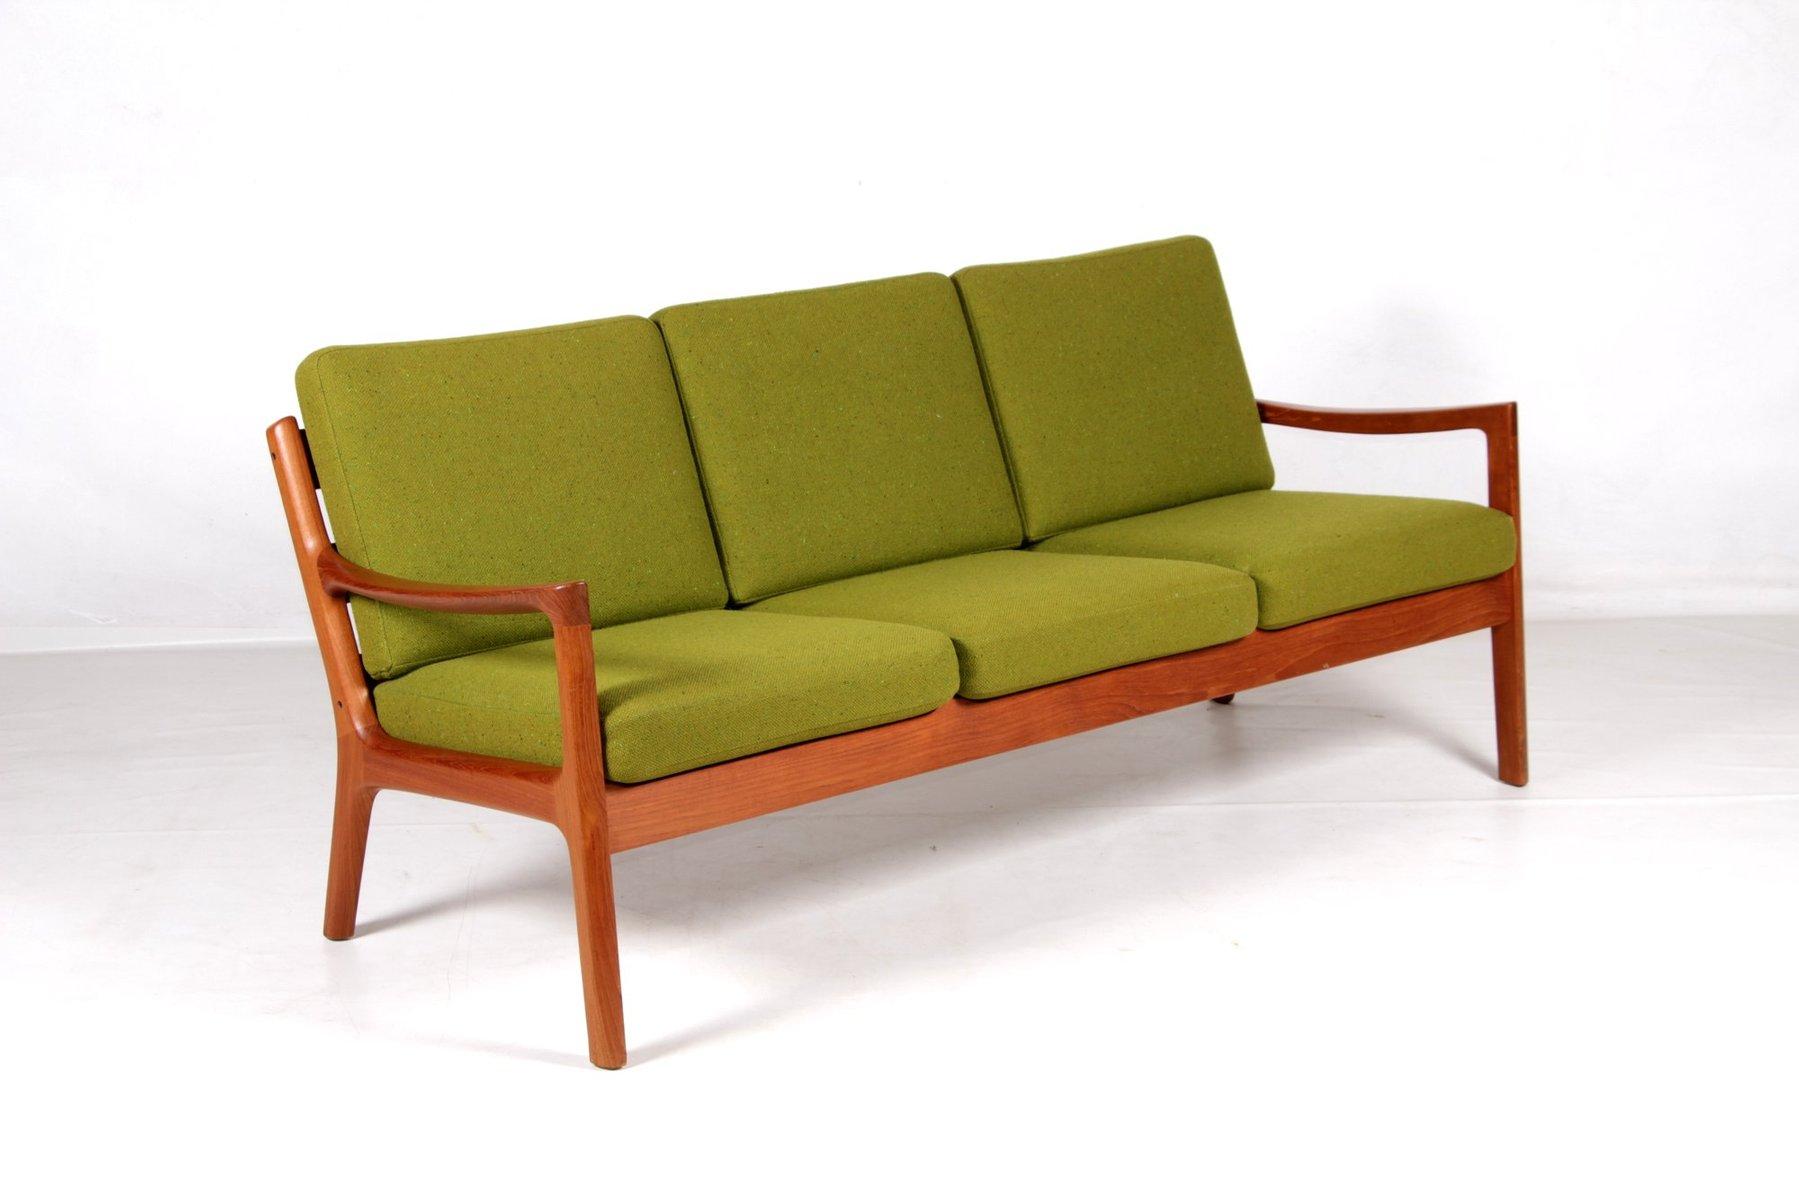 Teak Sofas Teak Wood Sofa In Chennai Tamil Nadu India Centaur Furniture Thesofa